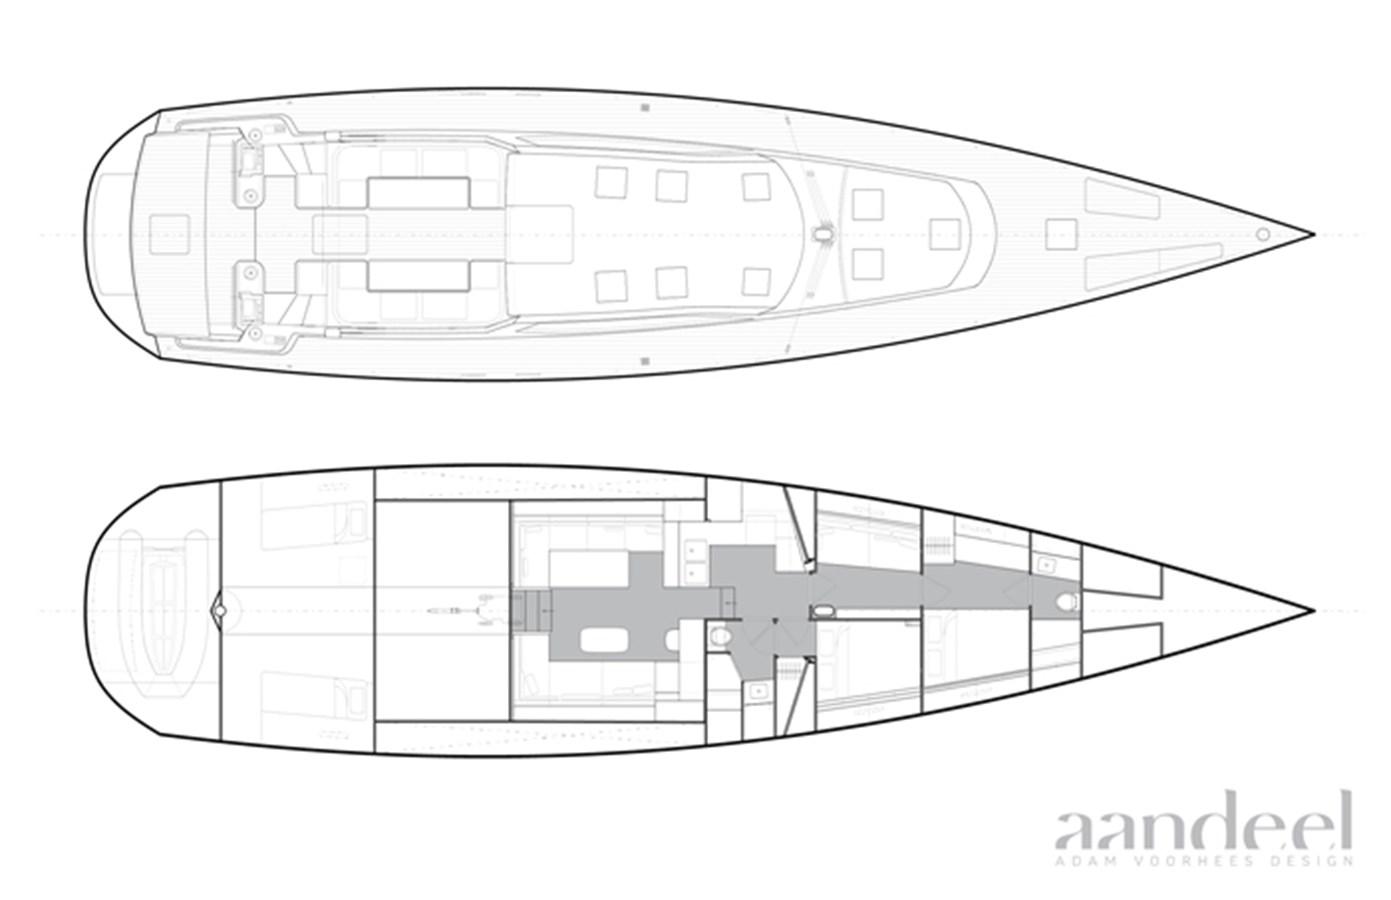 LAYOUT 1996 GOETZ CUSTOM BOATS/DERECKTOR SHIPYARDS Sparkman & Stephens Designed Performance Sailing Yacht Cruising Sailboat 2743884